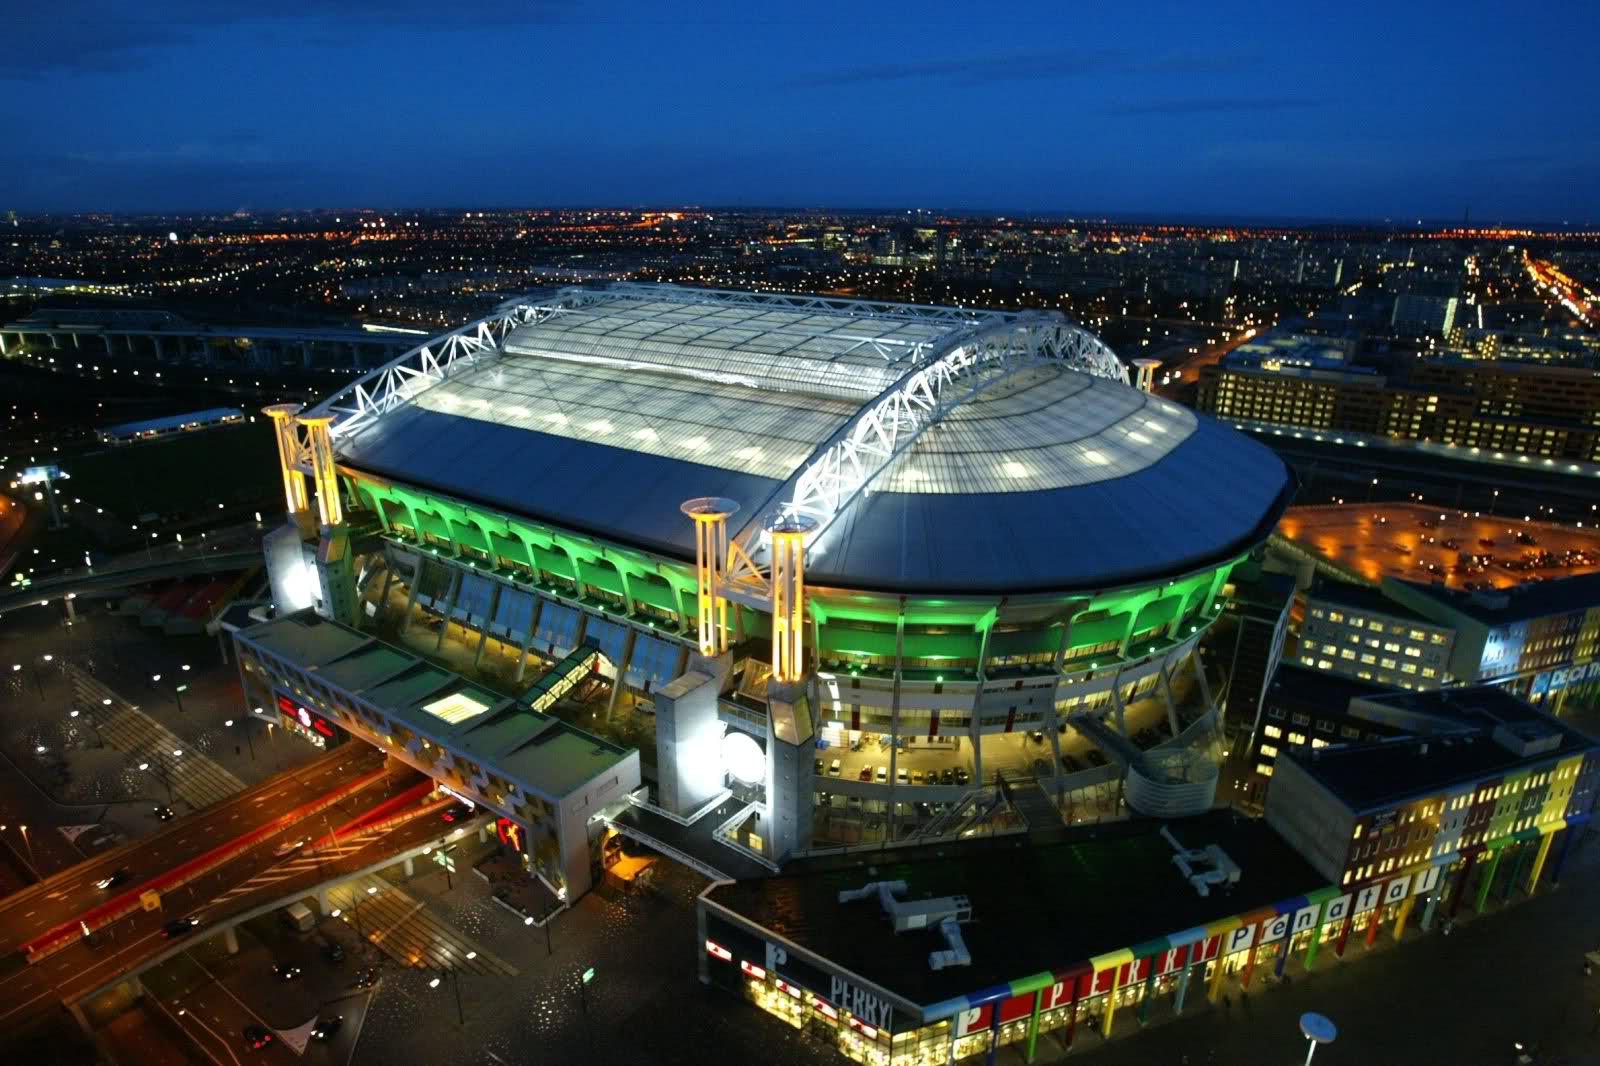 amsterdam arena (49)